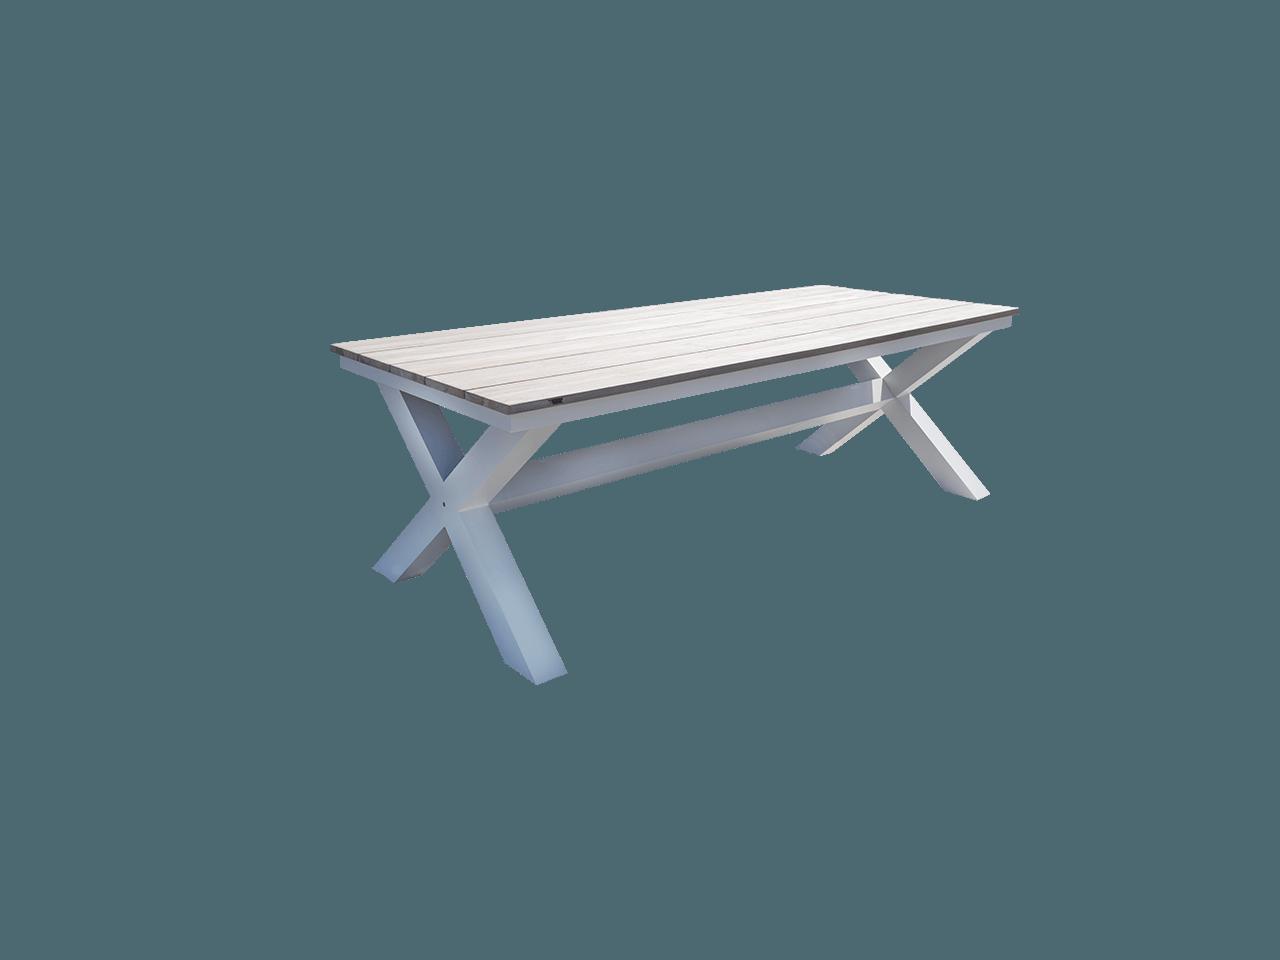 Picknick Tafel Aluminium.Picknick Tafel 8 Personen Teak Deco